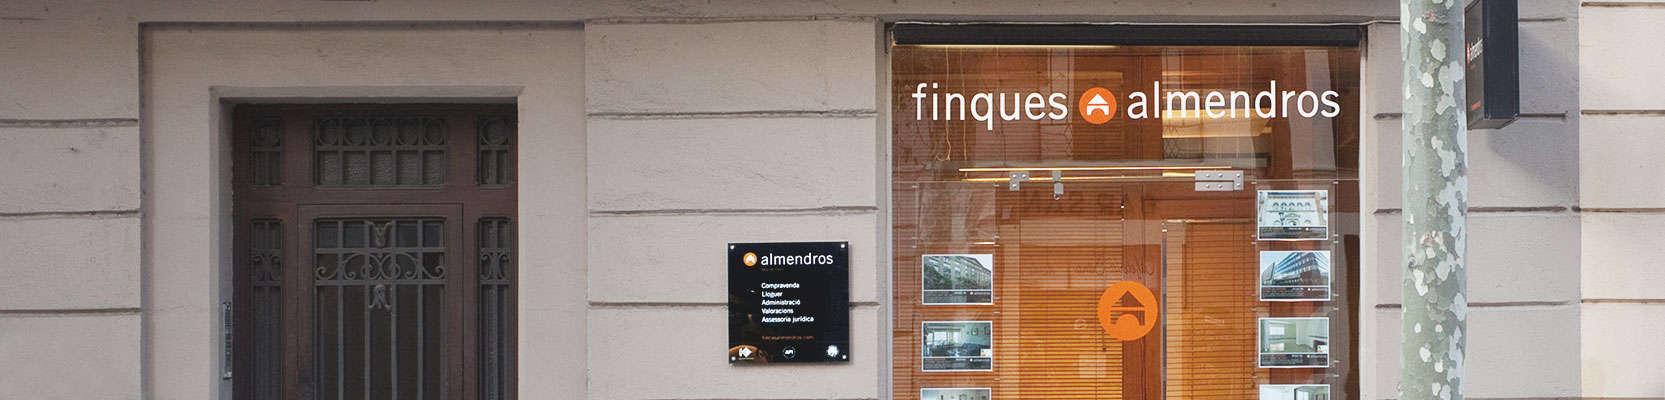 agencias inmobiliarias barcelona, fincas almendros